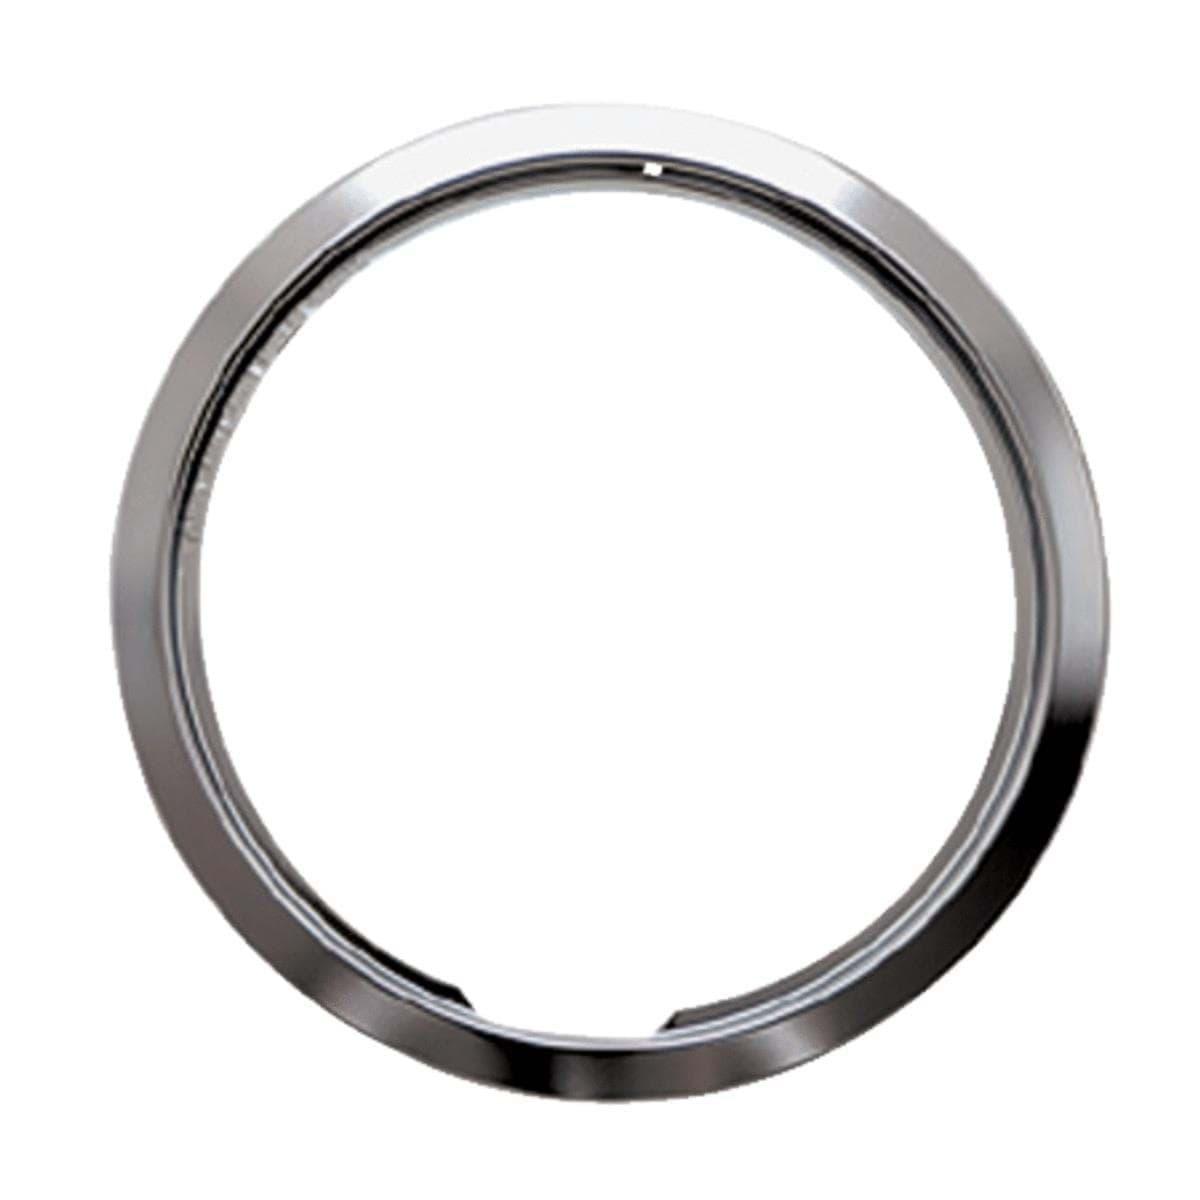 Ropesoapndope Range Kleen Chrome Universal Trim Ring